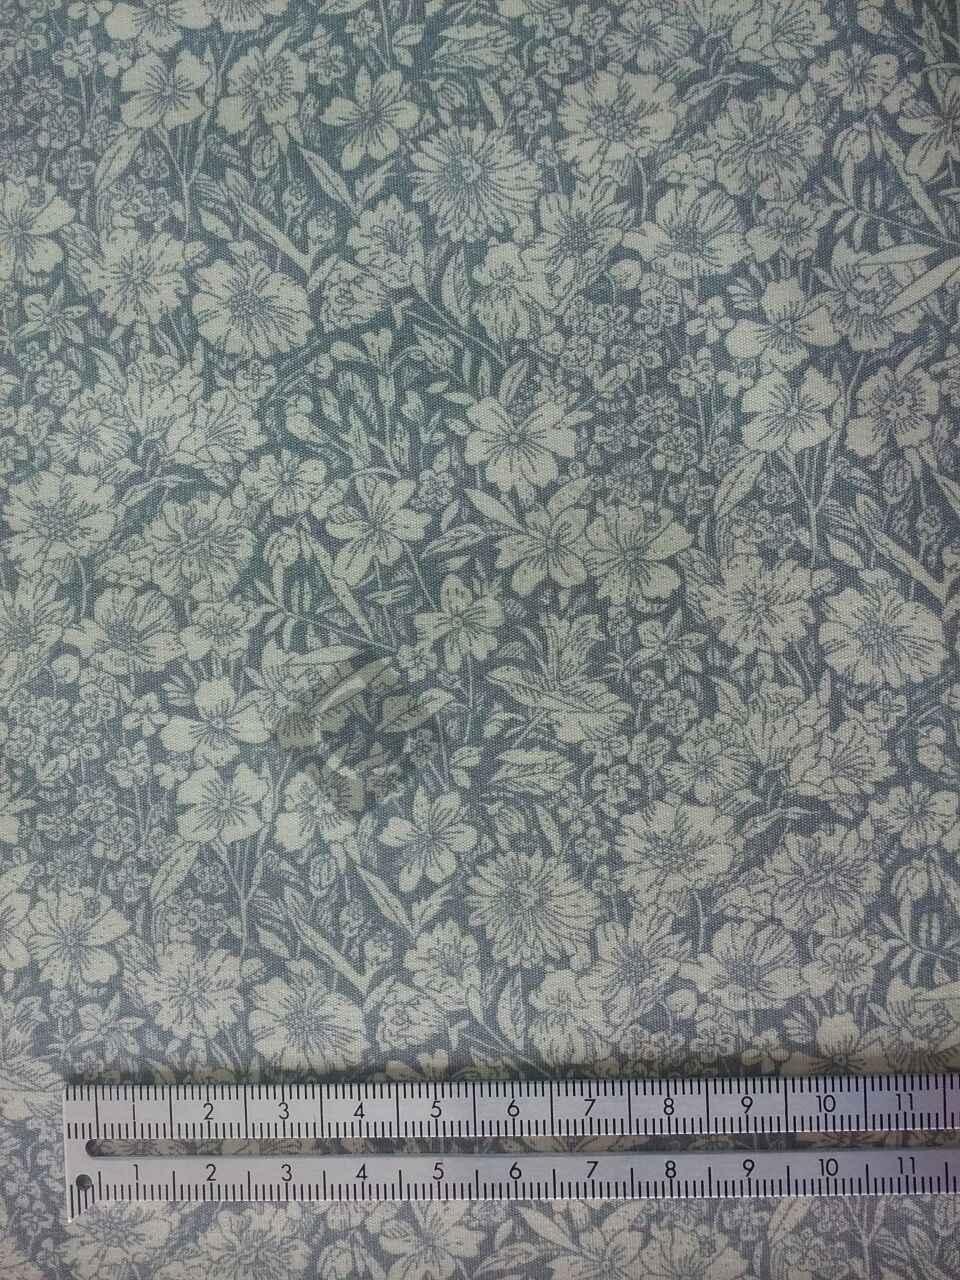 Grey Flower - code tba